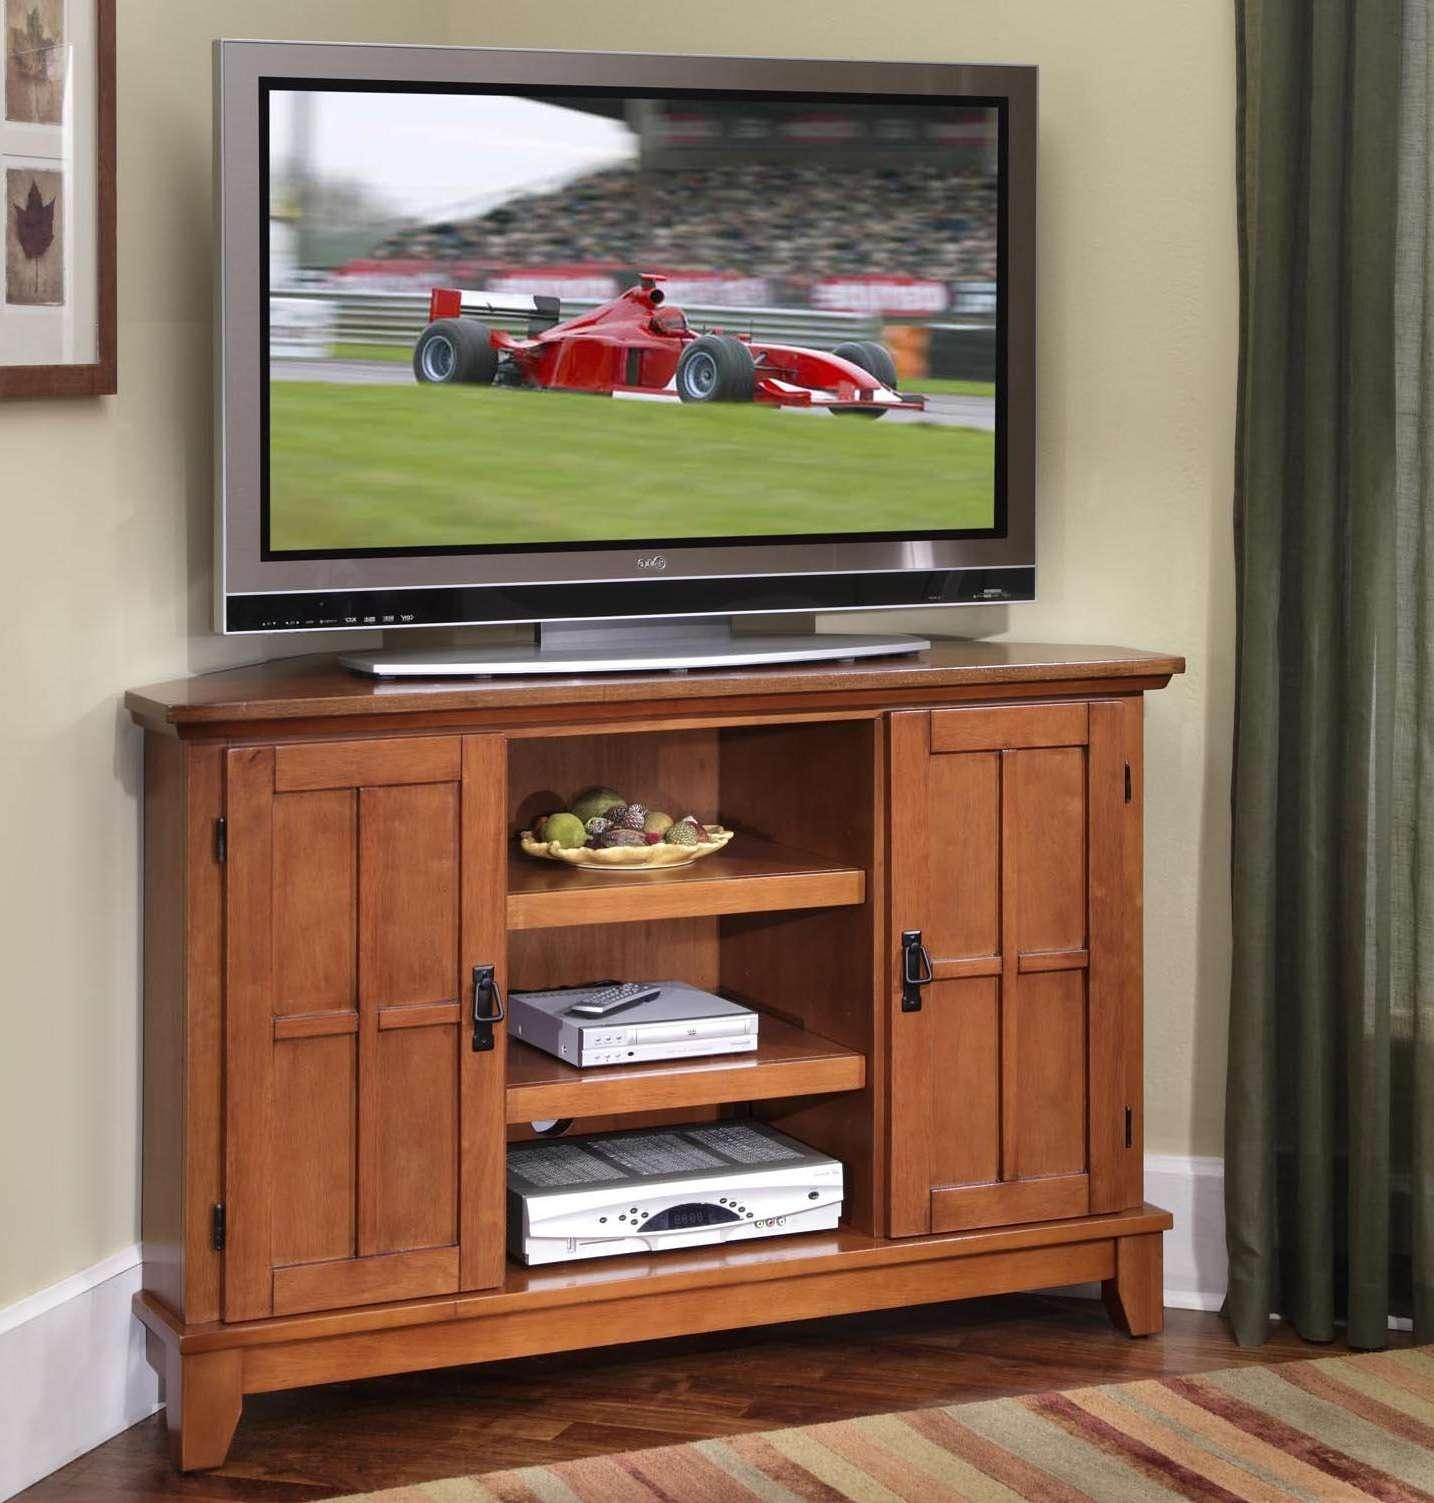 Tv : Unusual Lafayette Mahogany Corner Tv Stand Captivating Pertaining To Mahogany Corner Tv Cabinets (View 18 of 20)